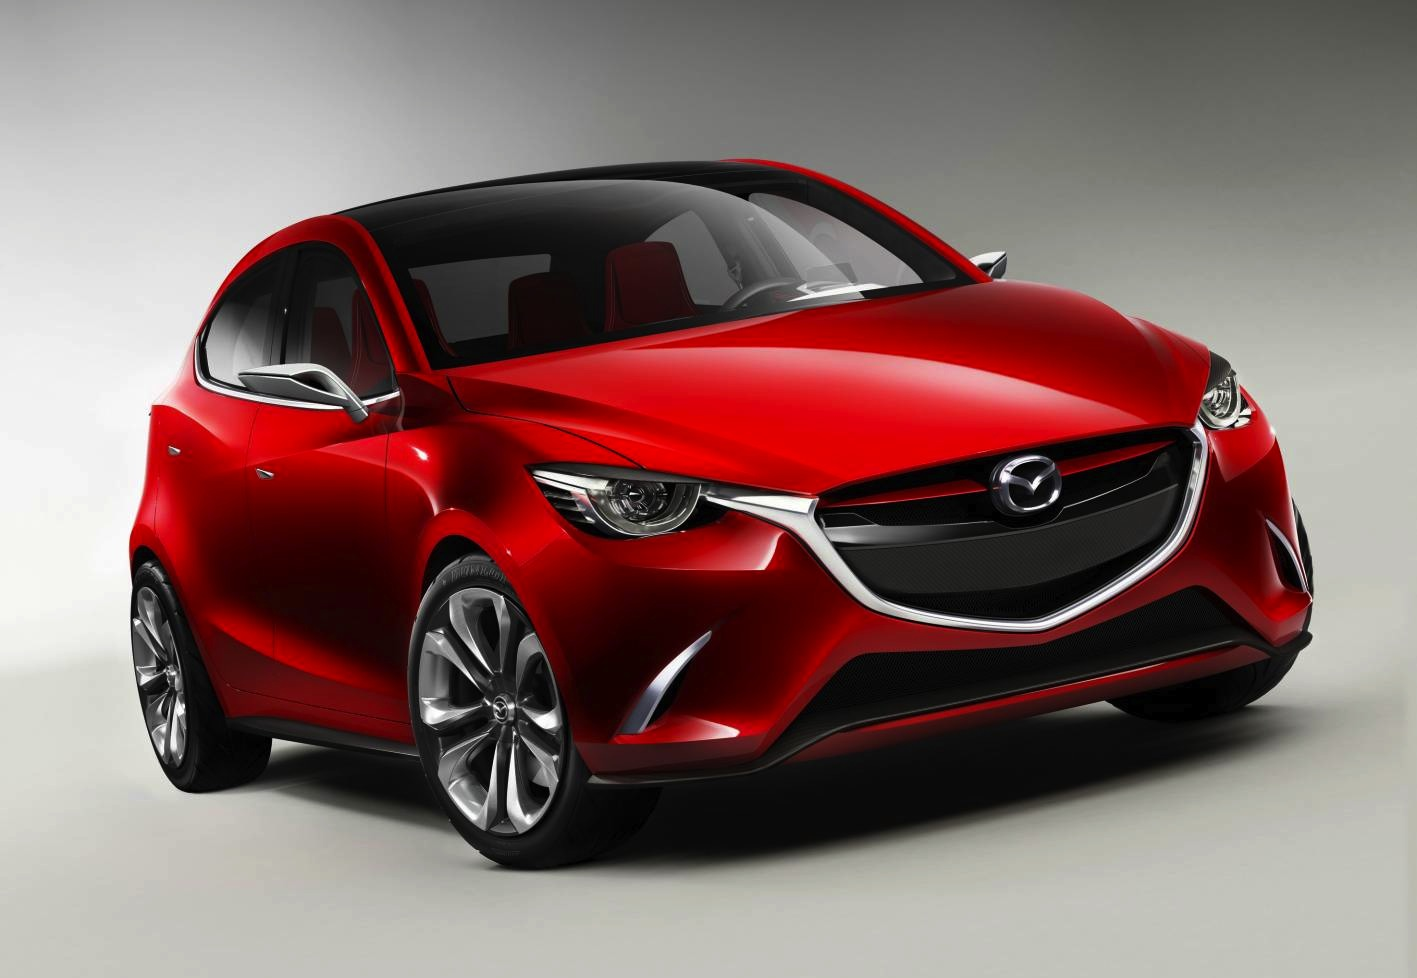 http://performancedrive.com.au/wp-content/uploads/2014/03/Mazda-Hazumi-concept-front.jpg